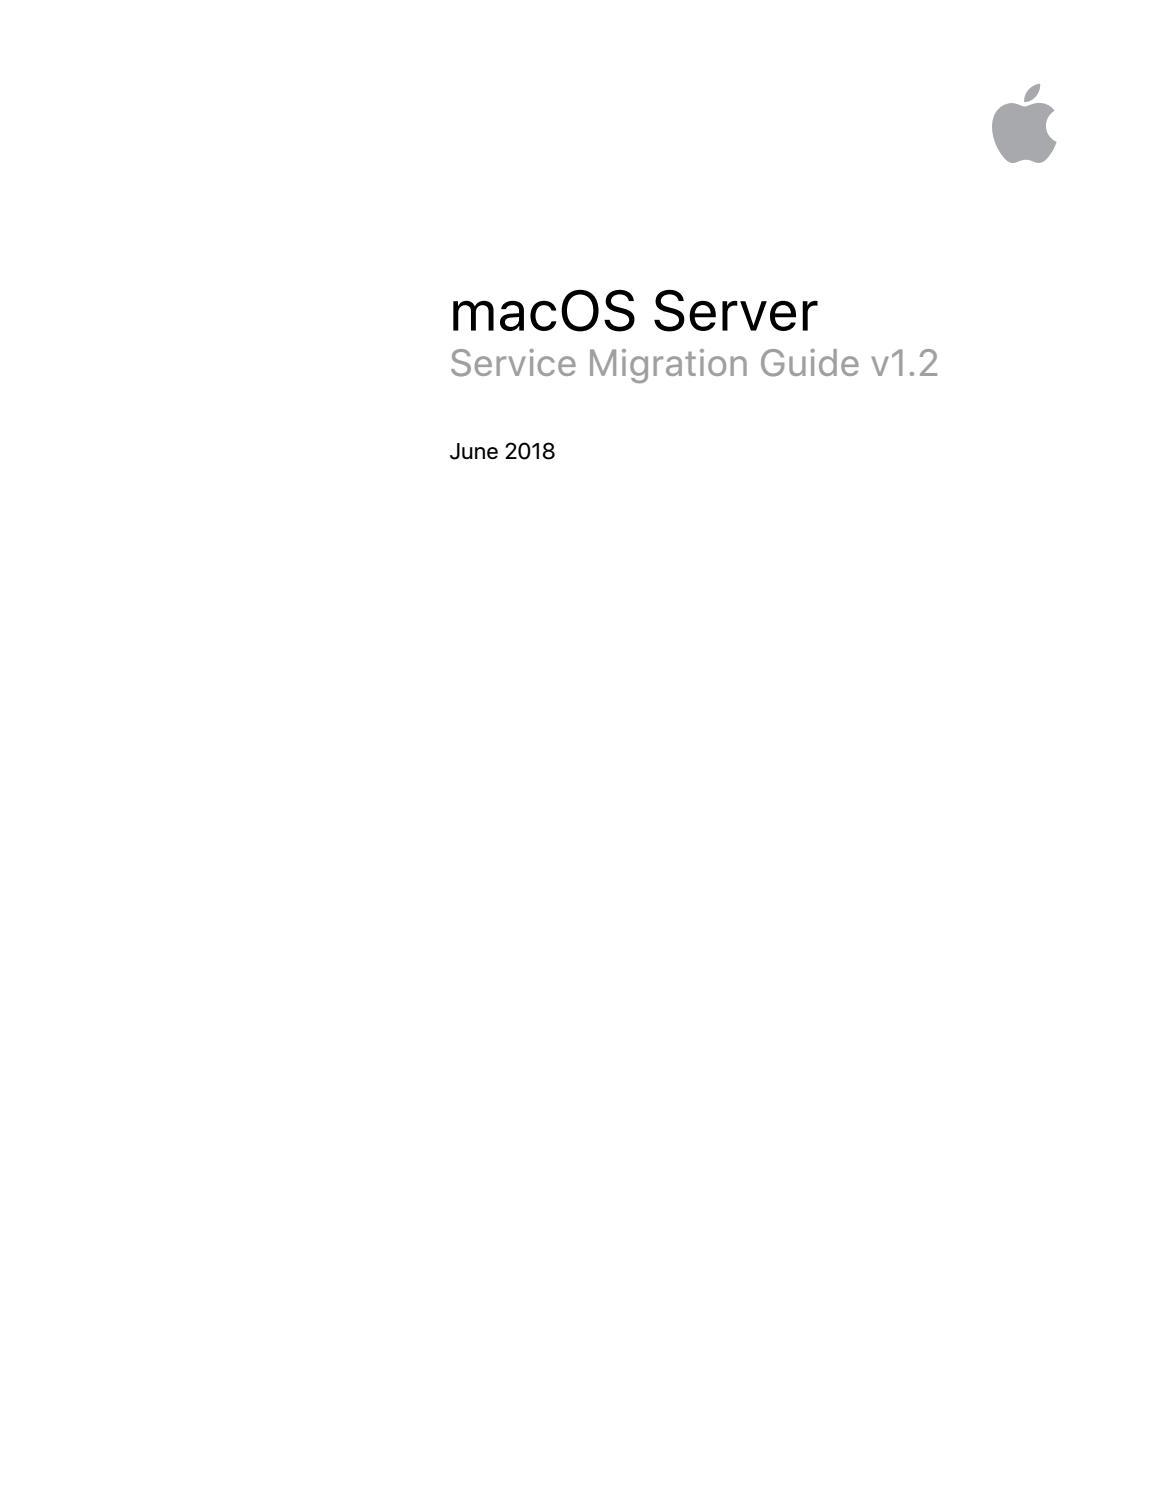 macOS Server Service Migration Guide by SASTG - issuu